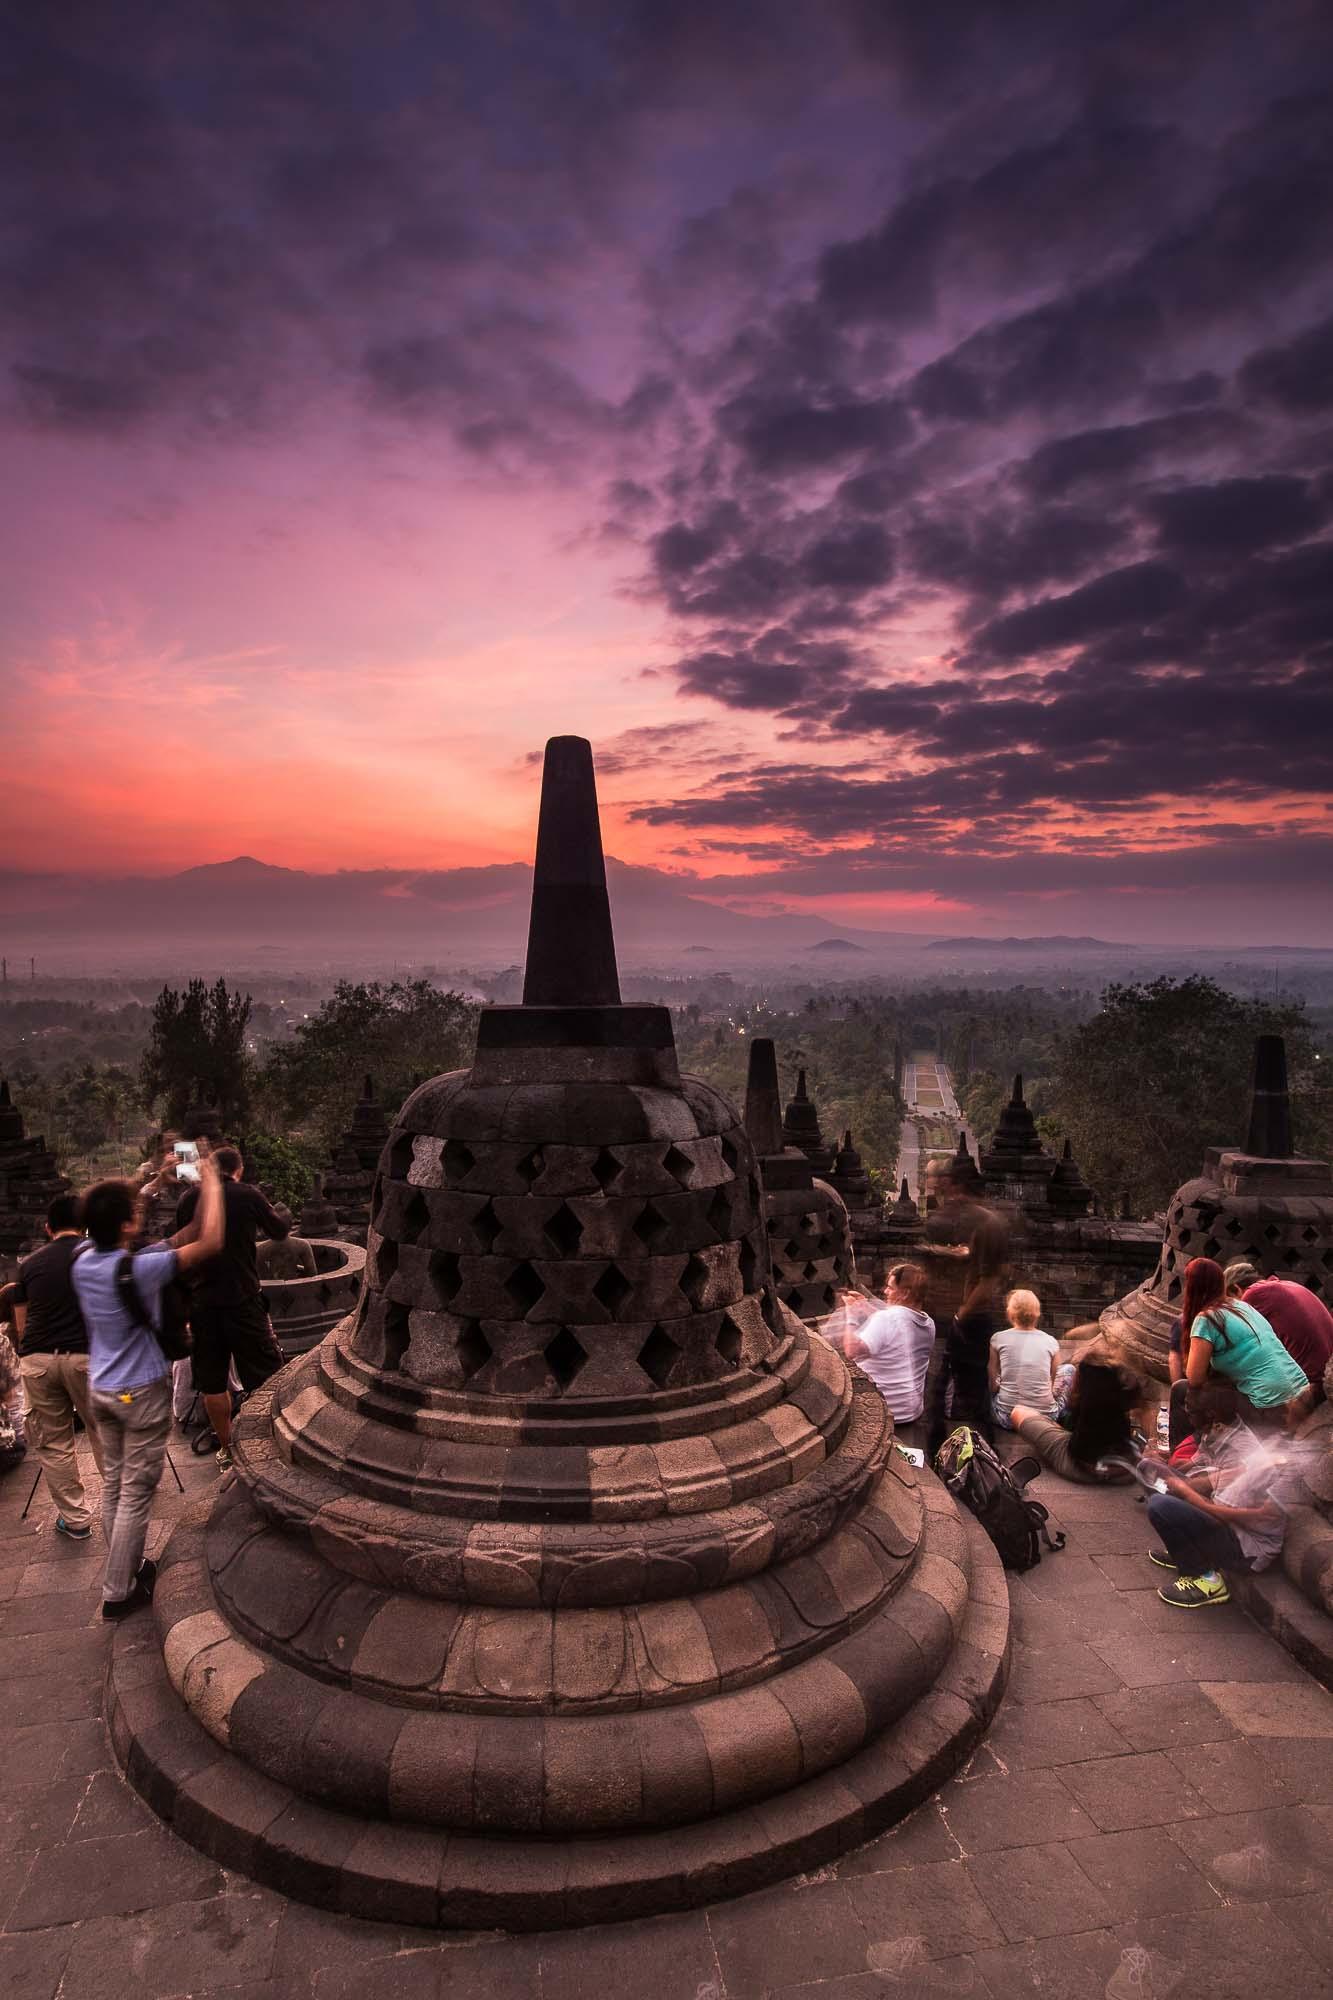 INDONESIA_2015_02 BOROBODUR-PRAMBANAN-YOGYA_JusMedic_109